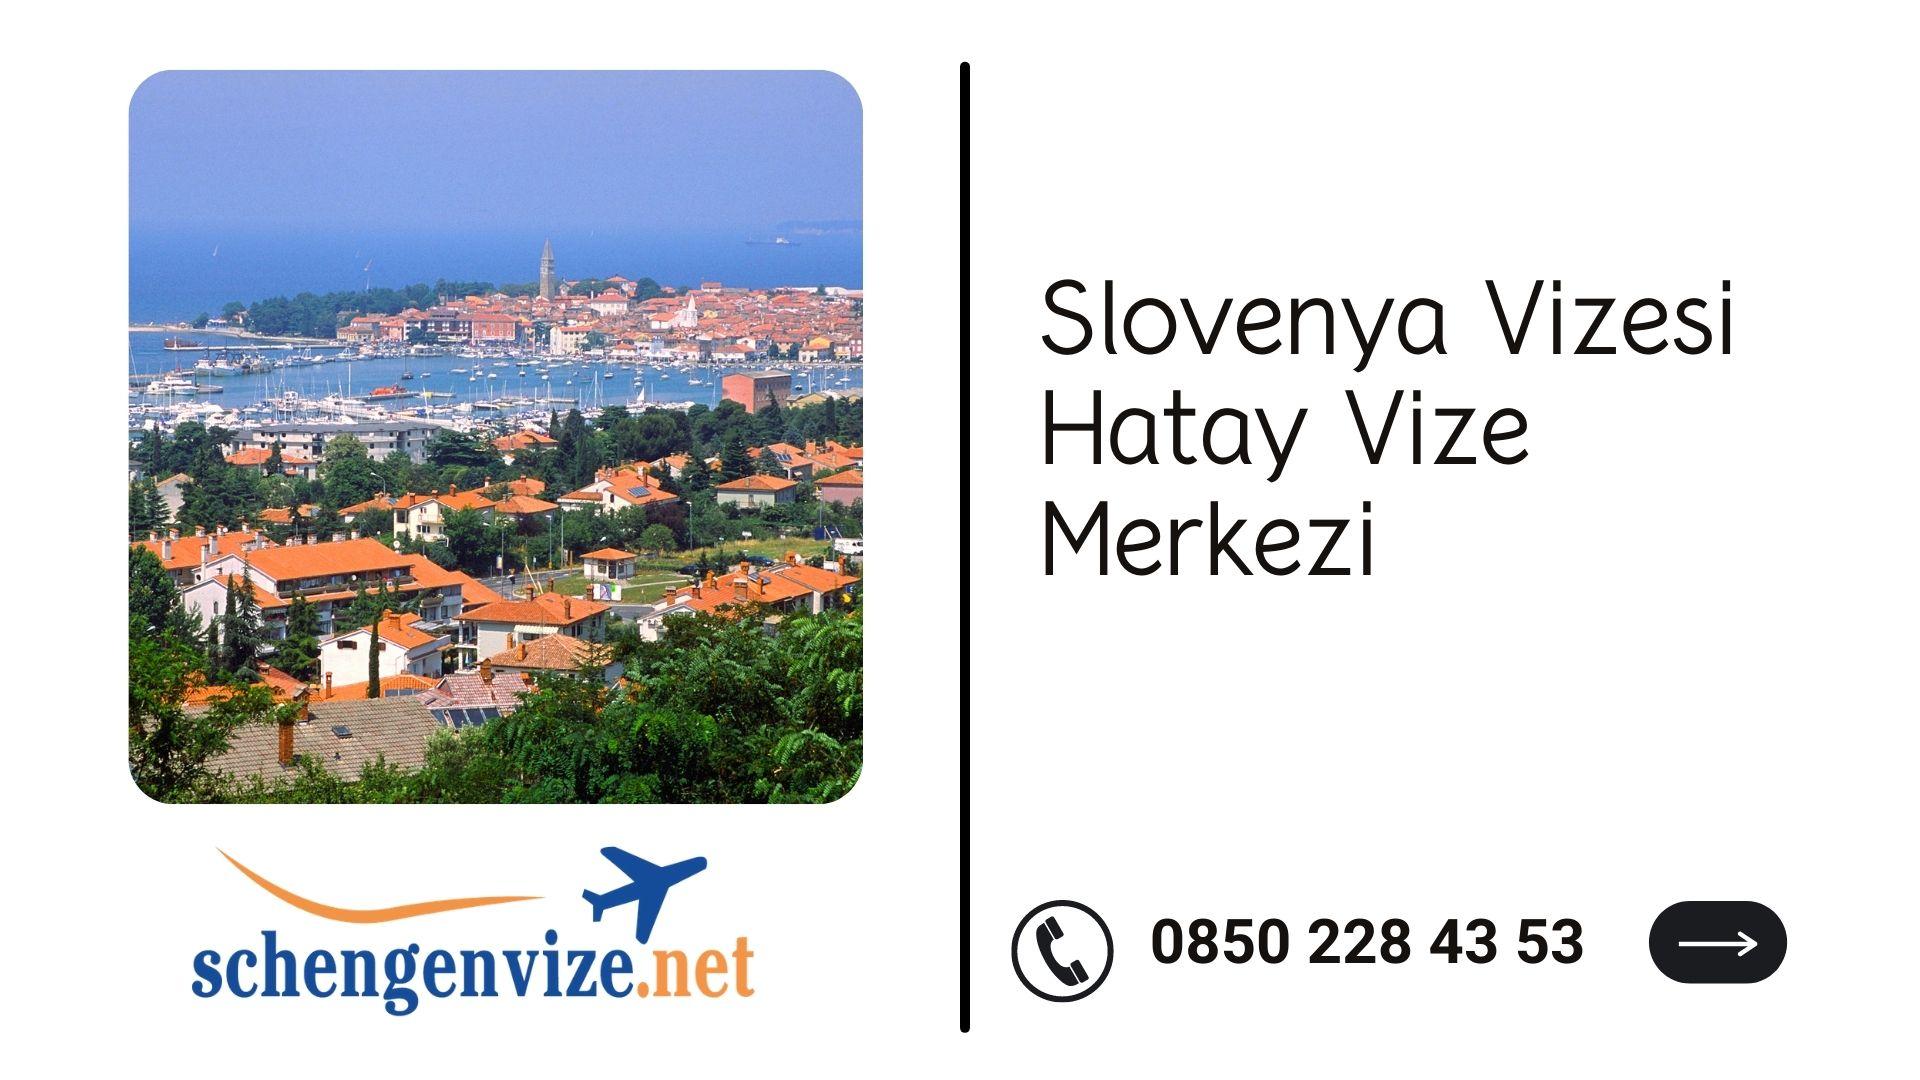 Slovenya Vizesi Hatay Vize Merkezi